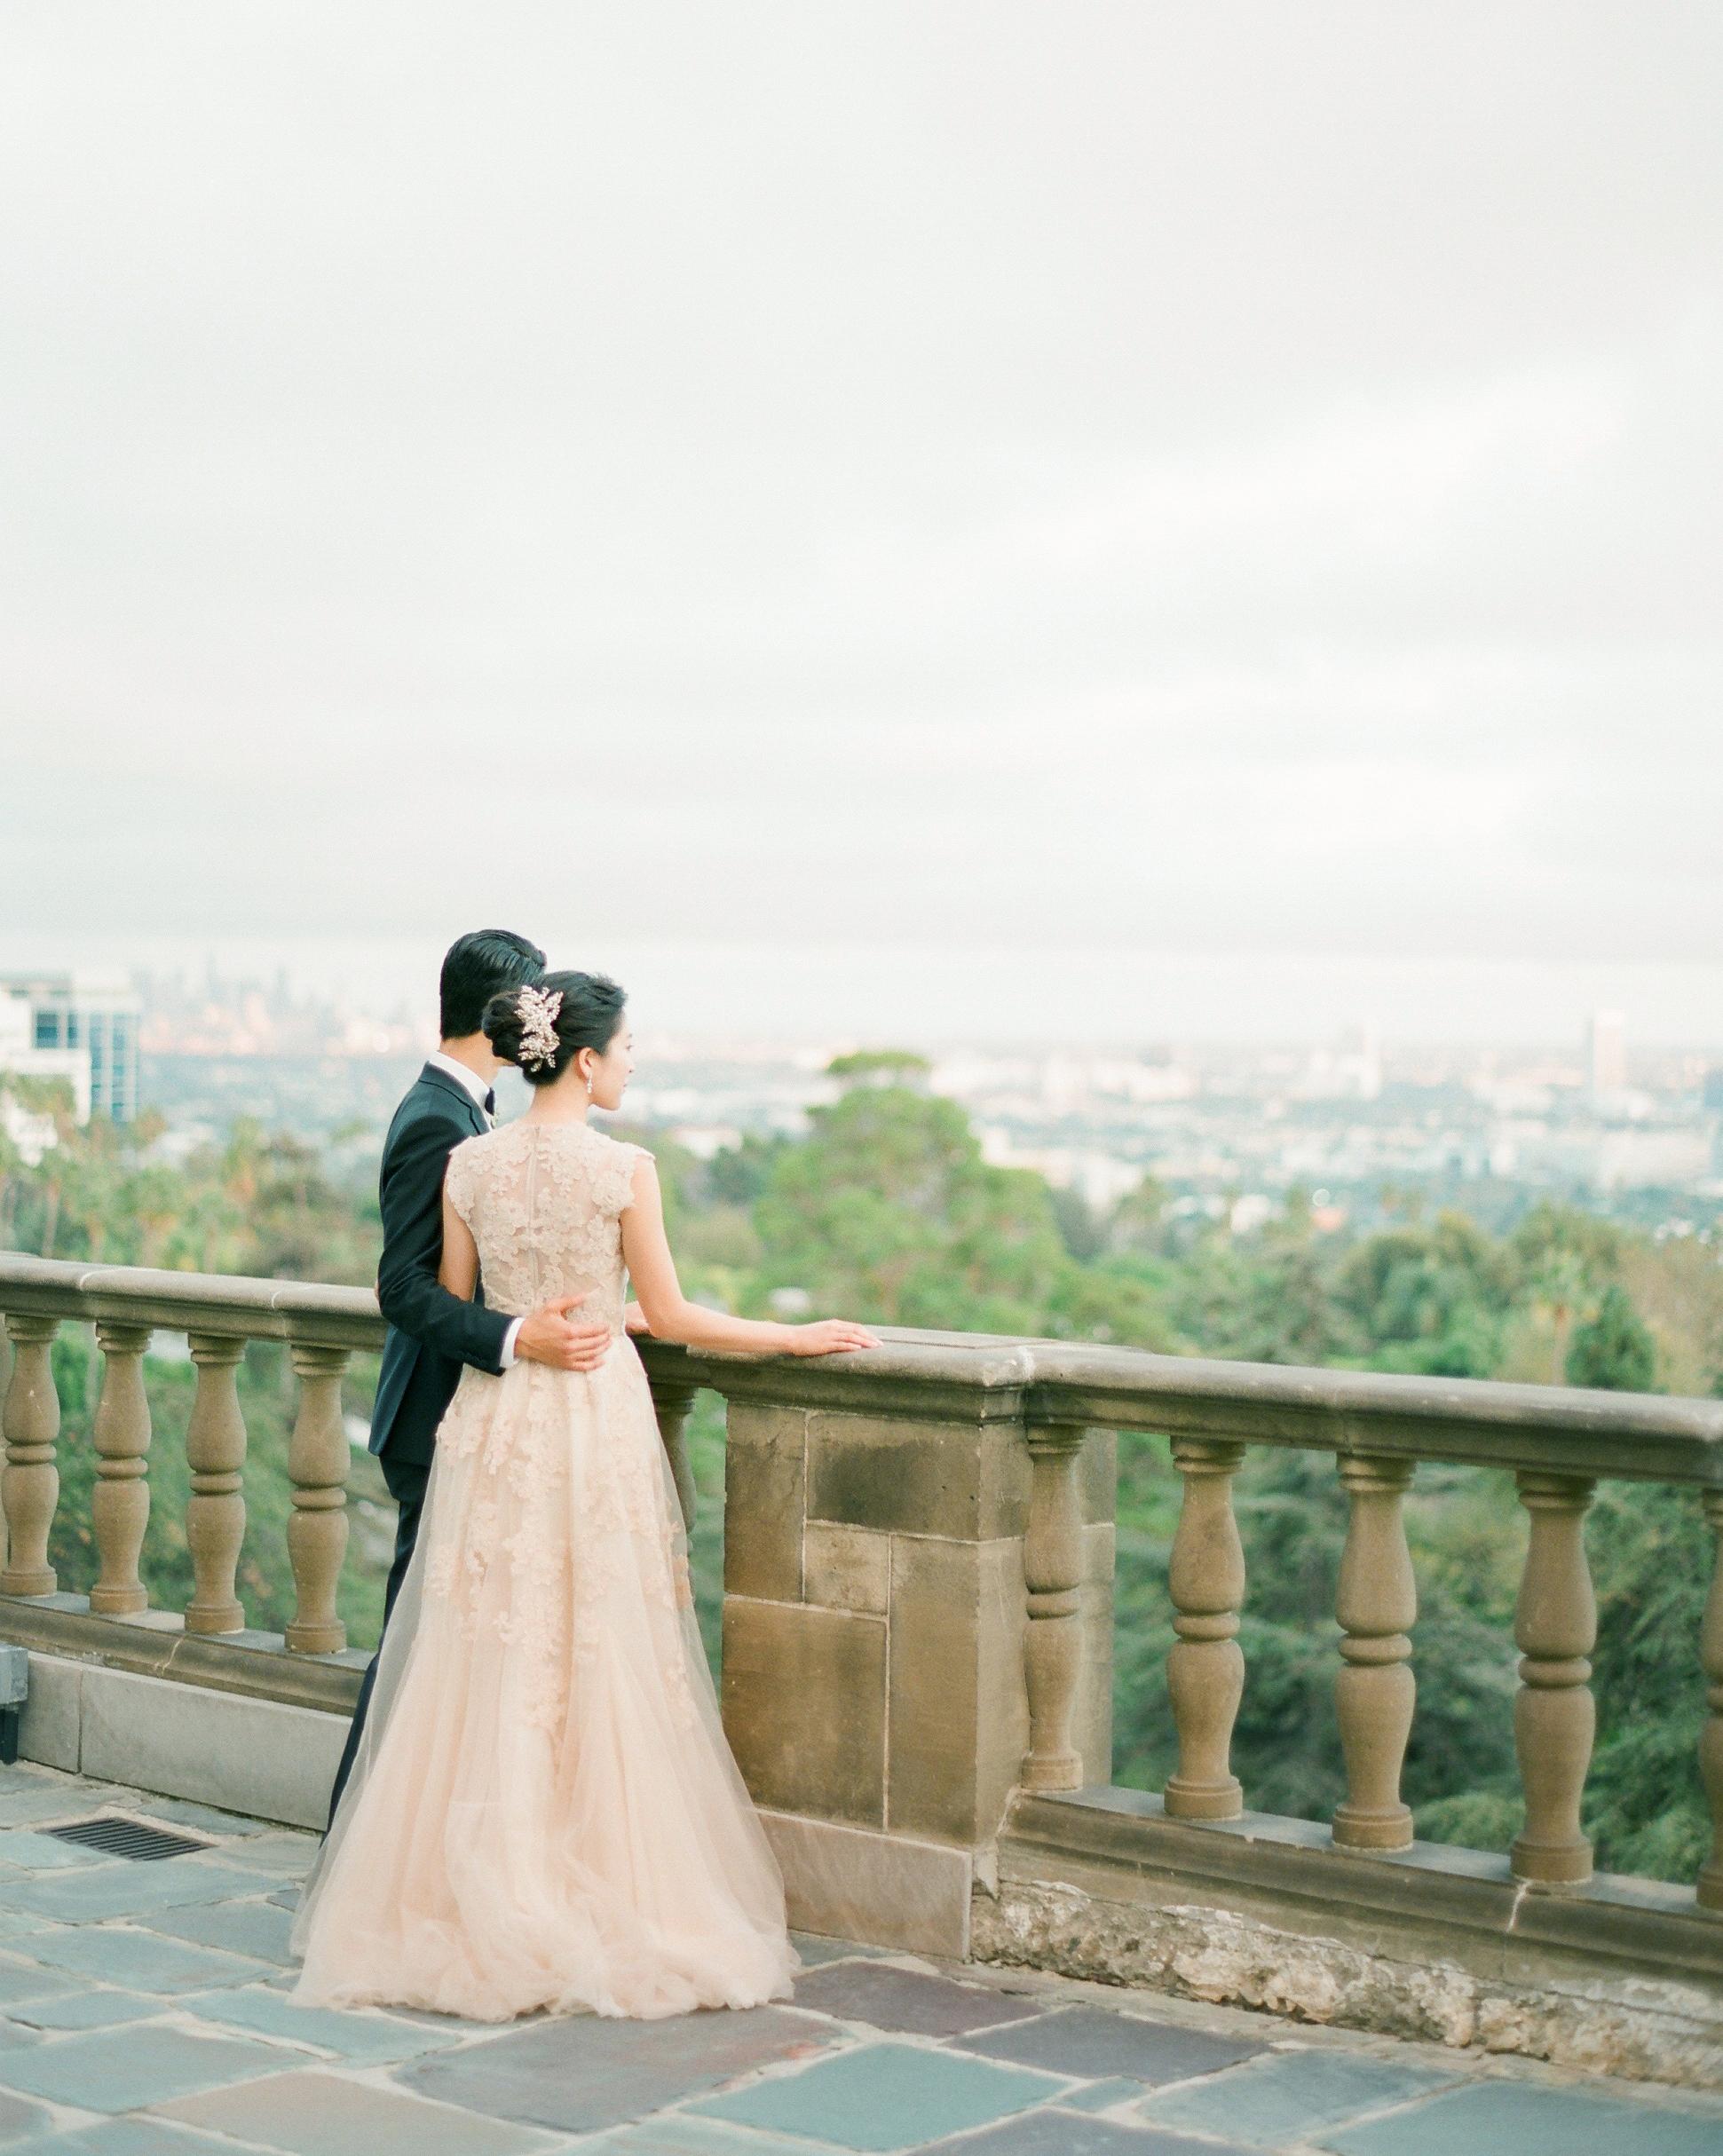 annie-tad-wedding-0323-s111160.jpg